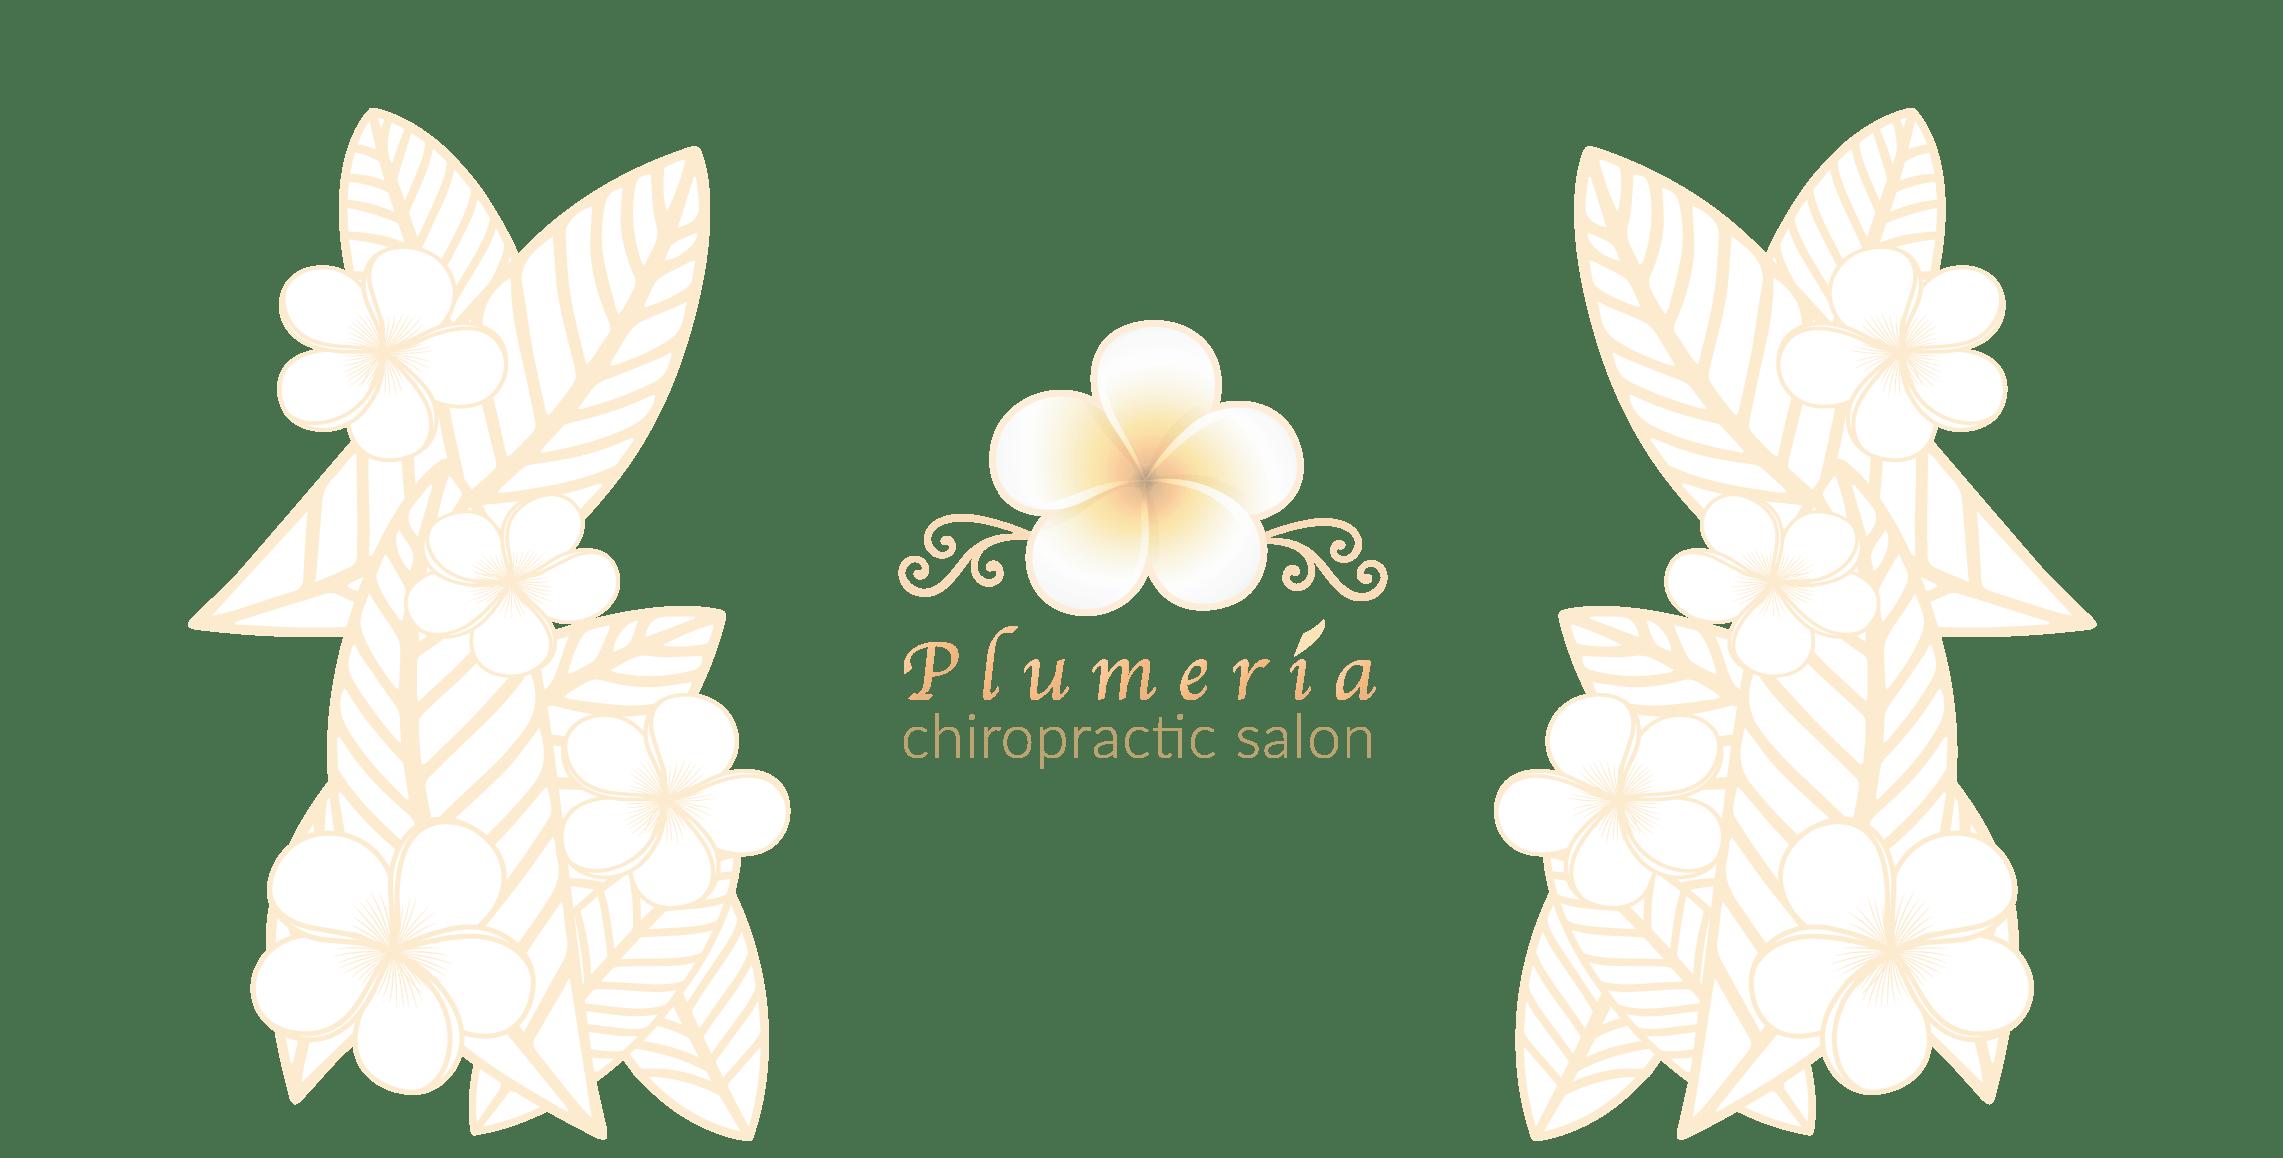 Plumeria Chiropractic salon